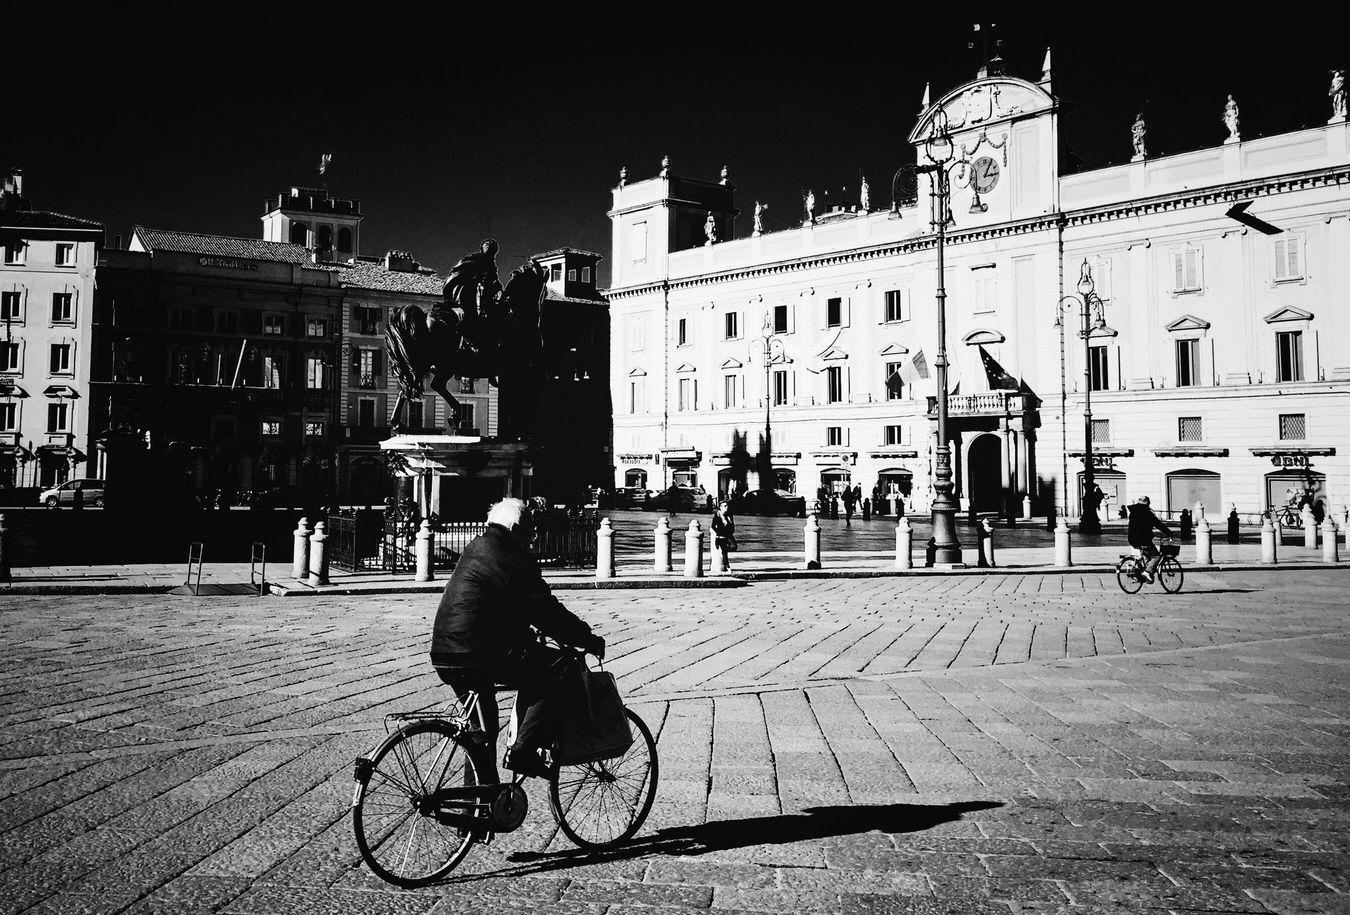 Piacenza Piazza Cavalli Italia Italy